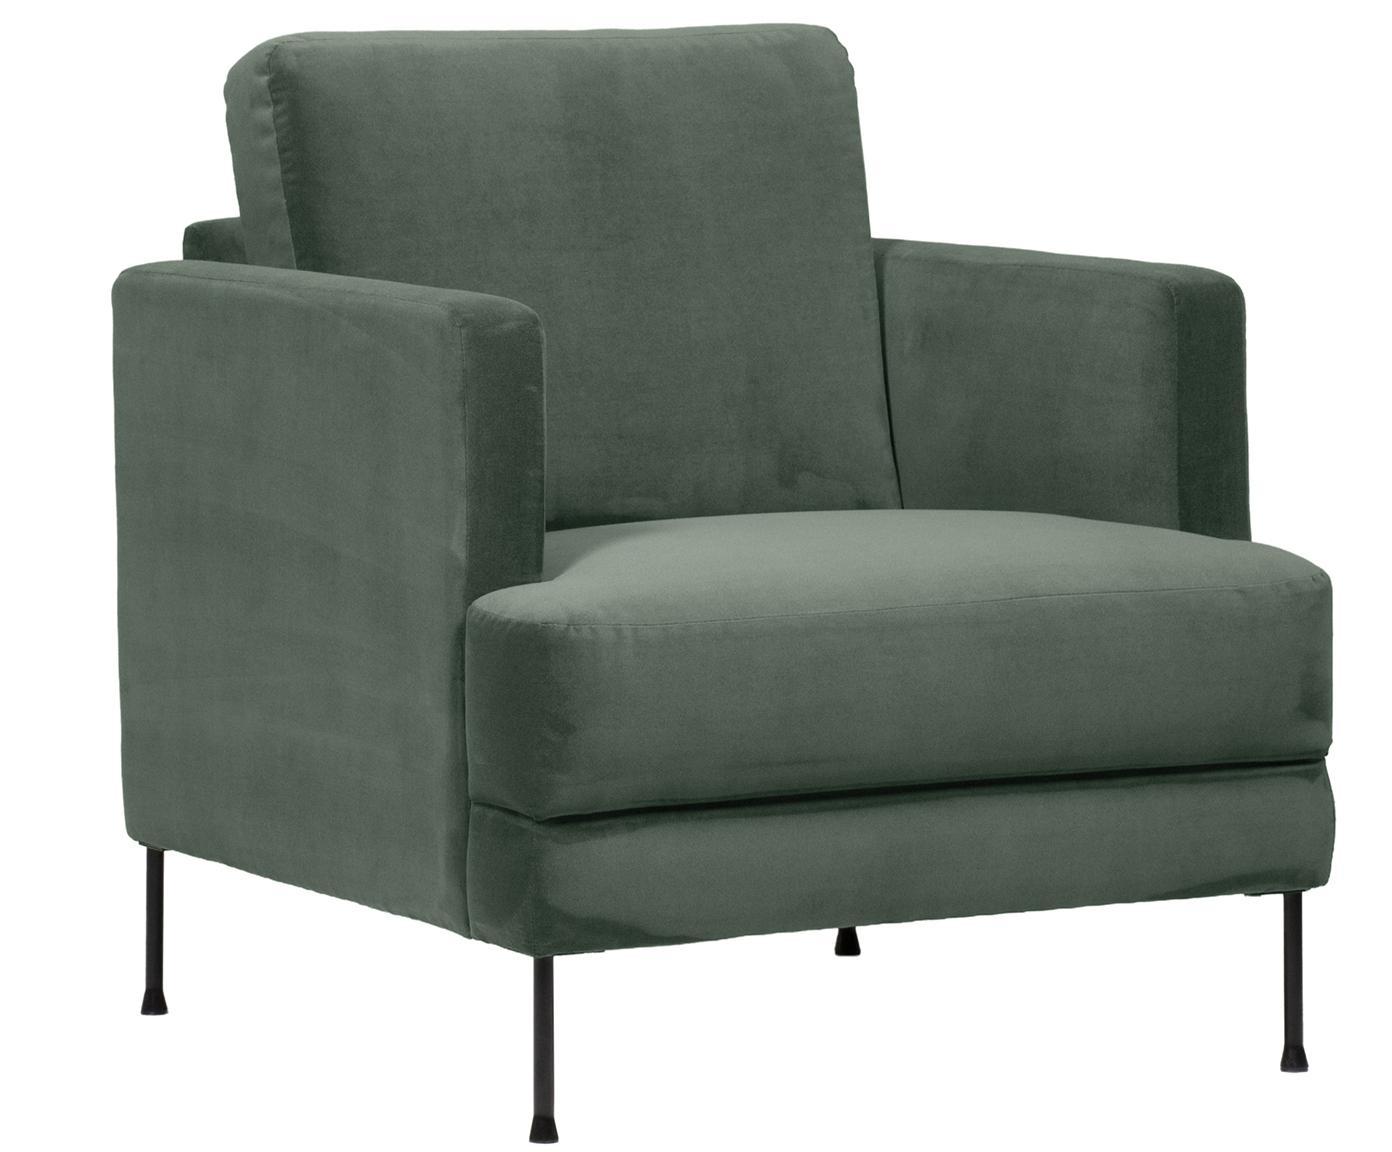 Fluwelen fauteuil Fluente, Bekleding: fluweel (hoogwaardig poly, Frame: massief grenenhout, Poten: gelakt metaal, Groen, B 76 x D 83 cm